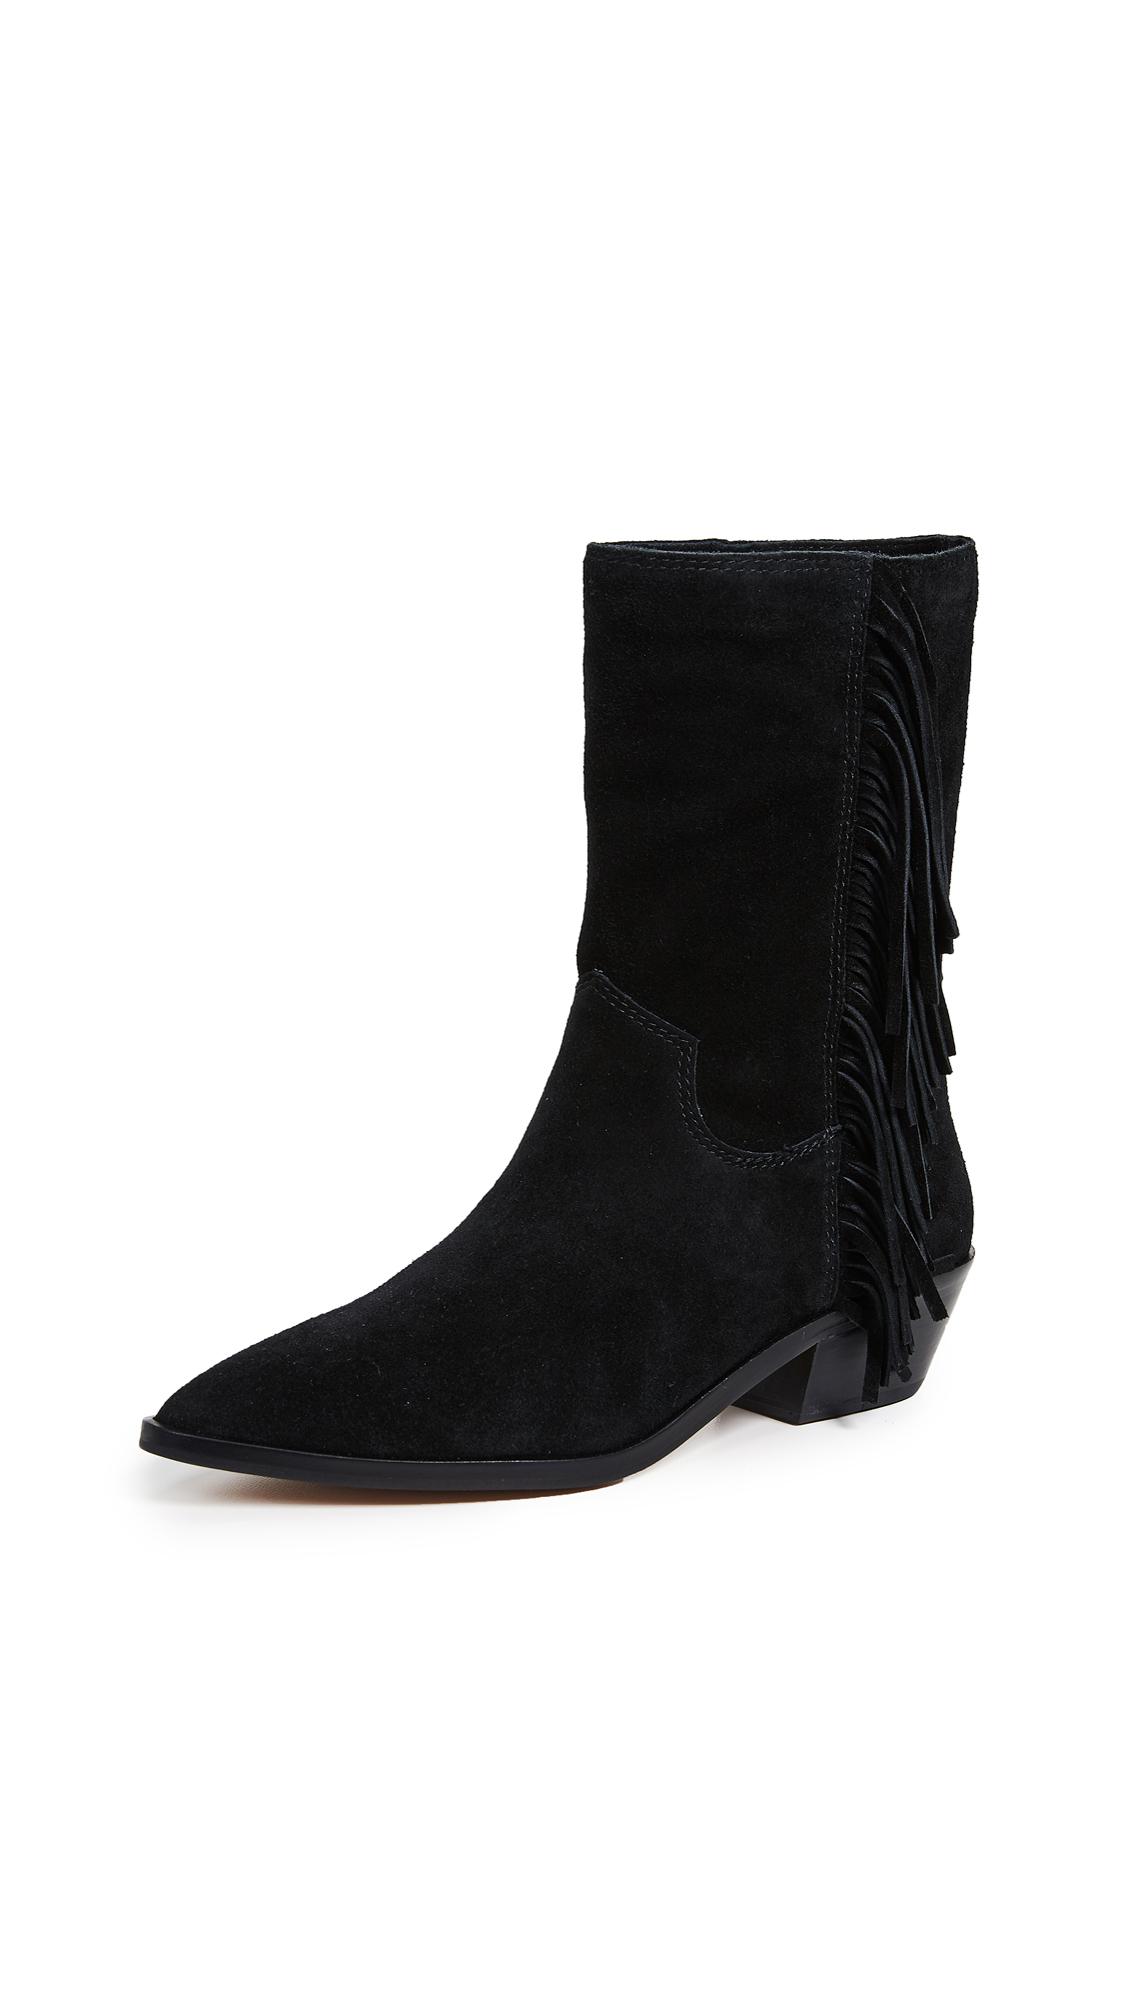 Rebecca Minkoff Krissa Fringe Western Boots - Black